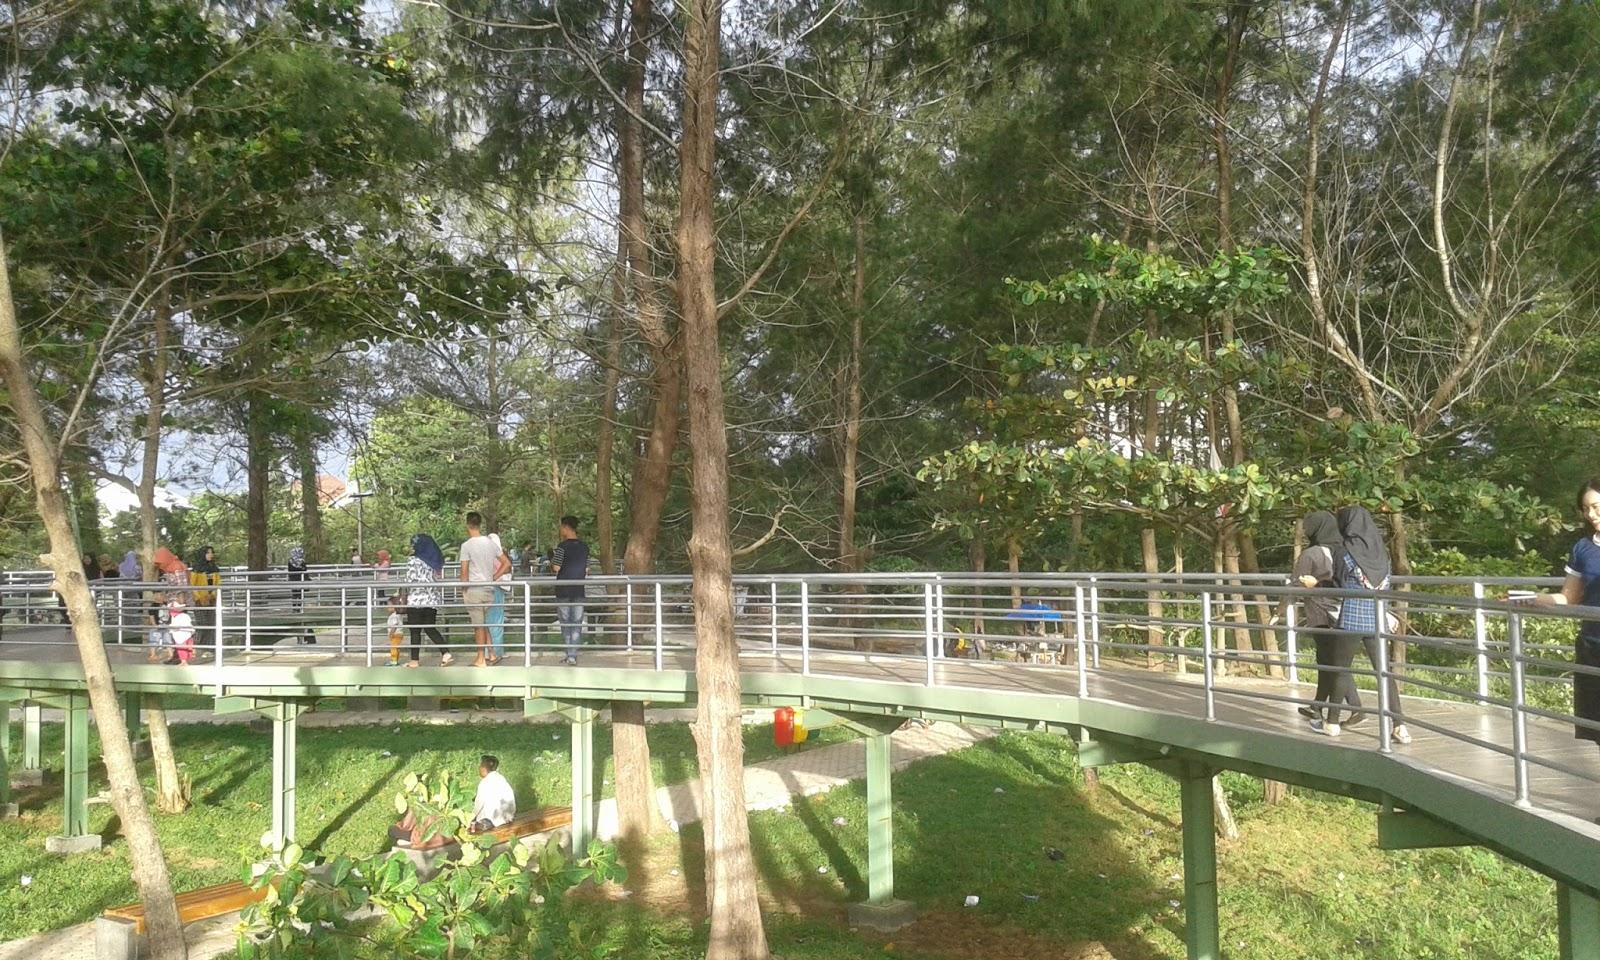 Taman Pantai Berkas Wisata Ramai Berjalan Jalan Sepanjang Jembatan Sambil